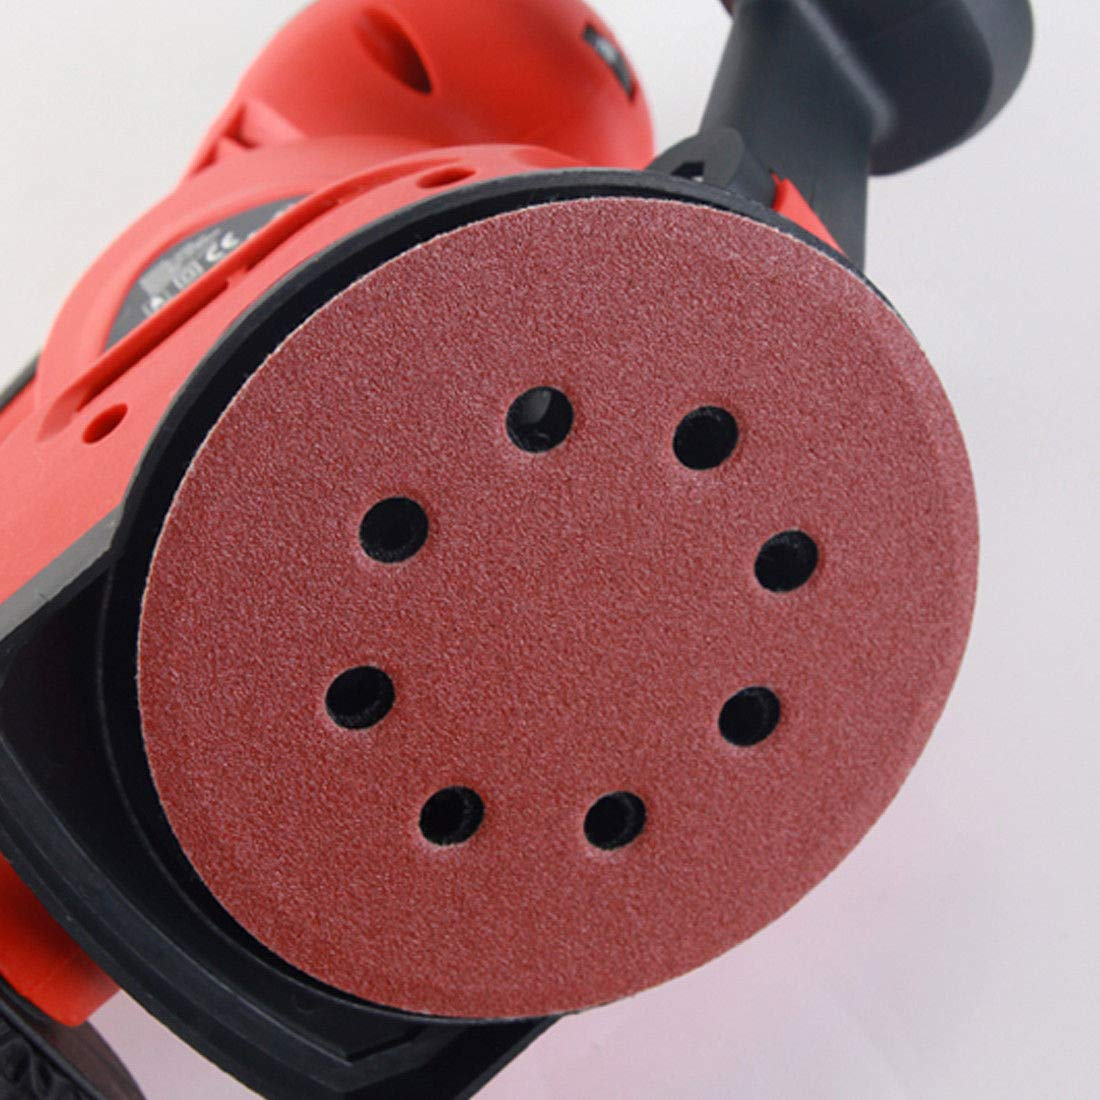 100x 125mm 5 Inch Sanding Disc 100 Grit Orbital Sander Pads Abrasive Sandpaper